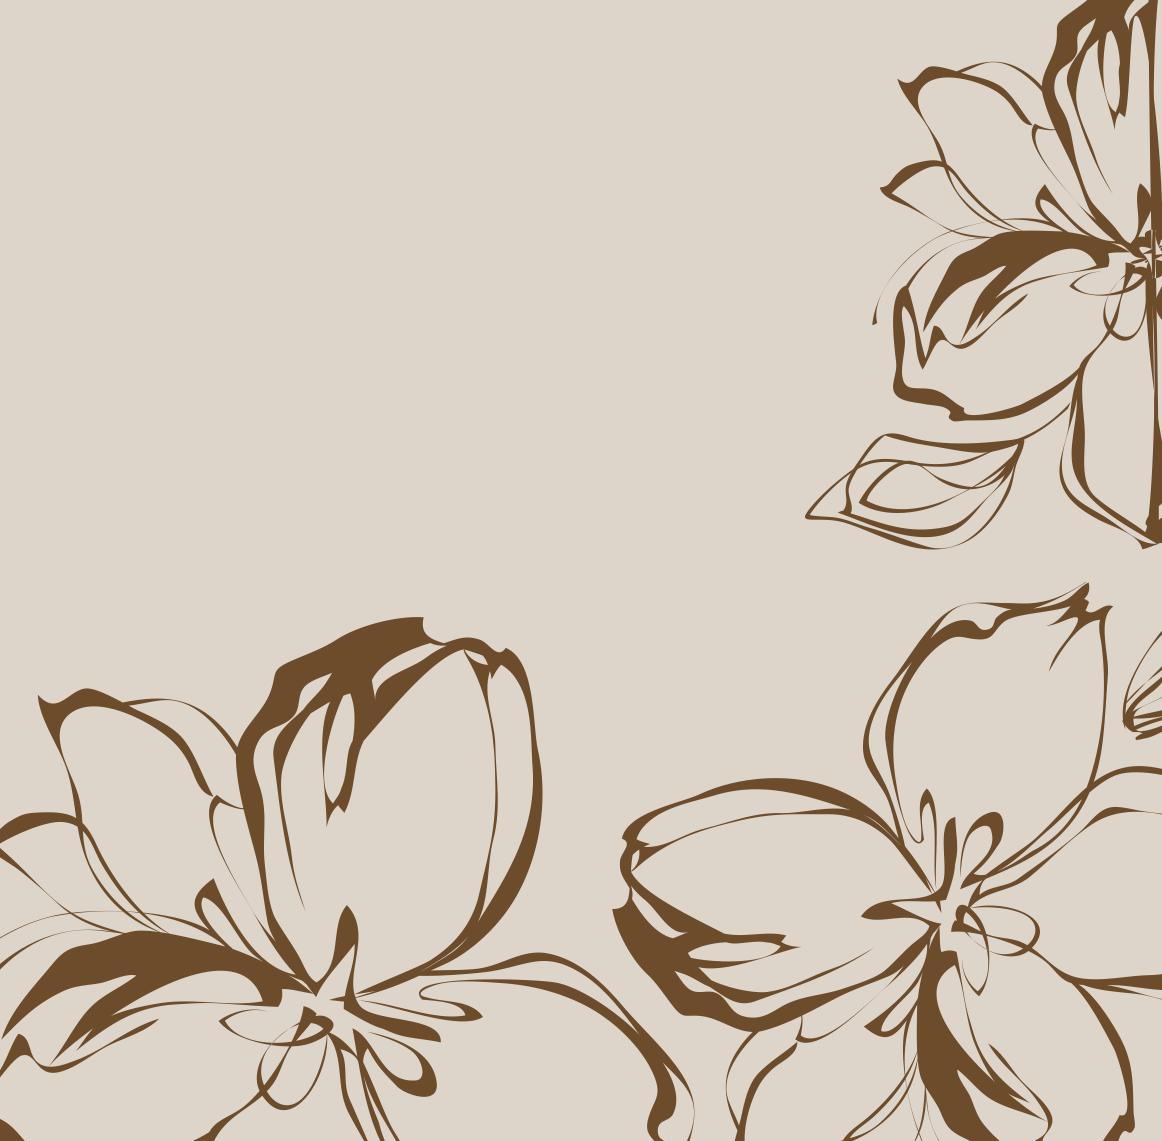 TOVAGLIOLO FLOWERS PANNA 40X40